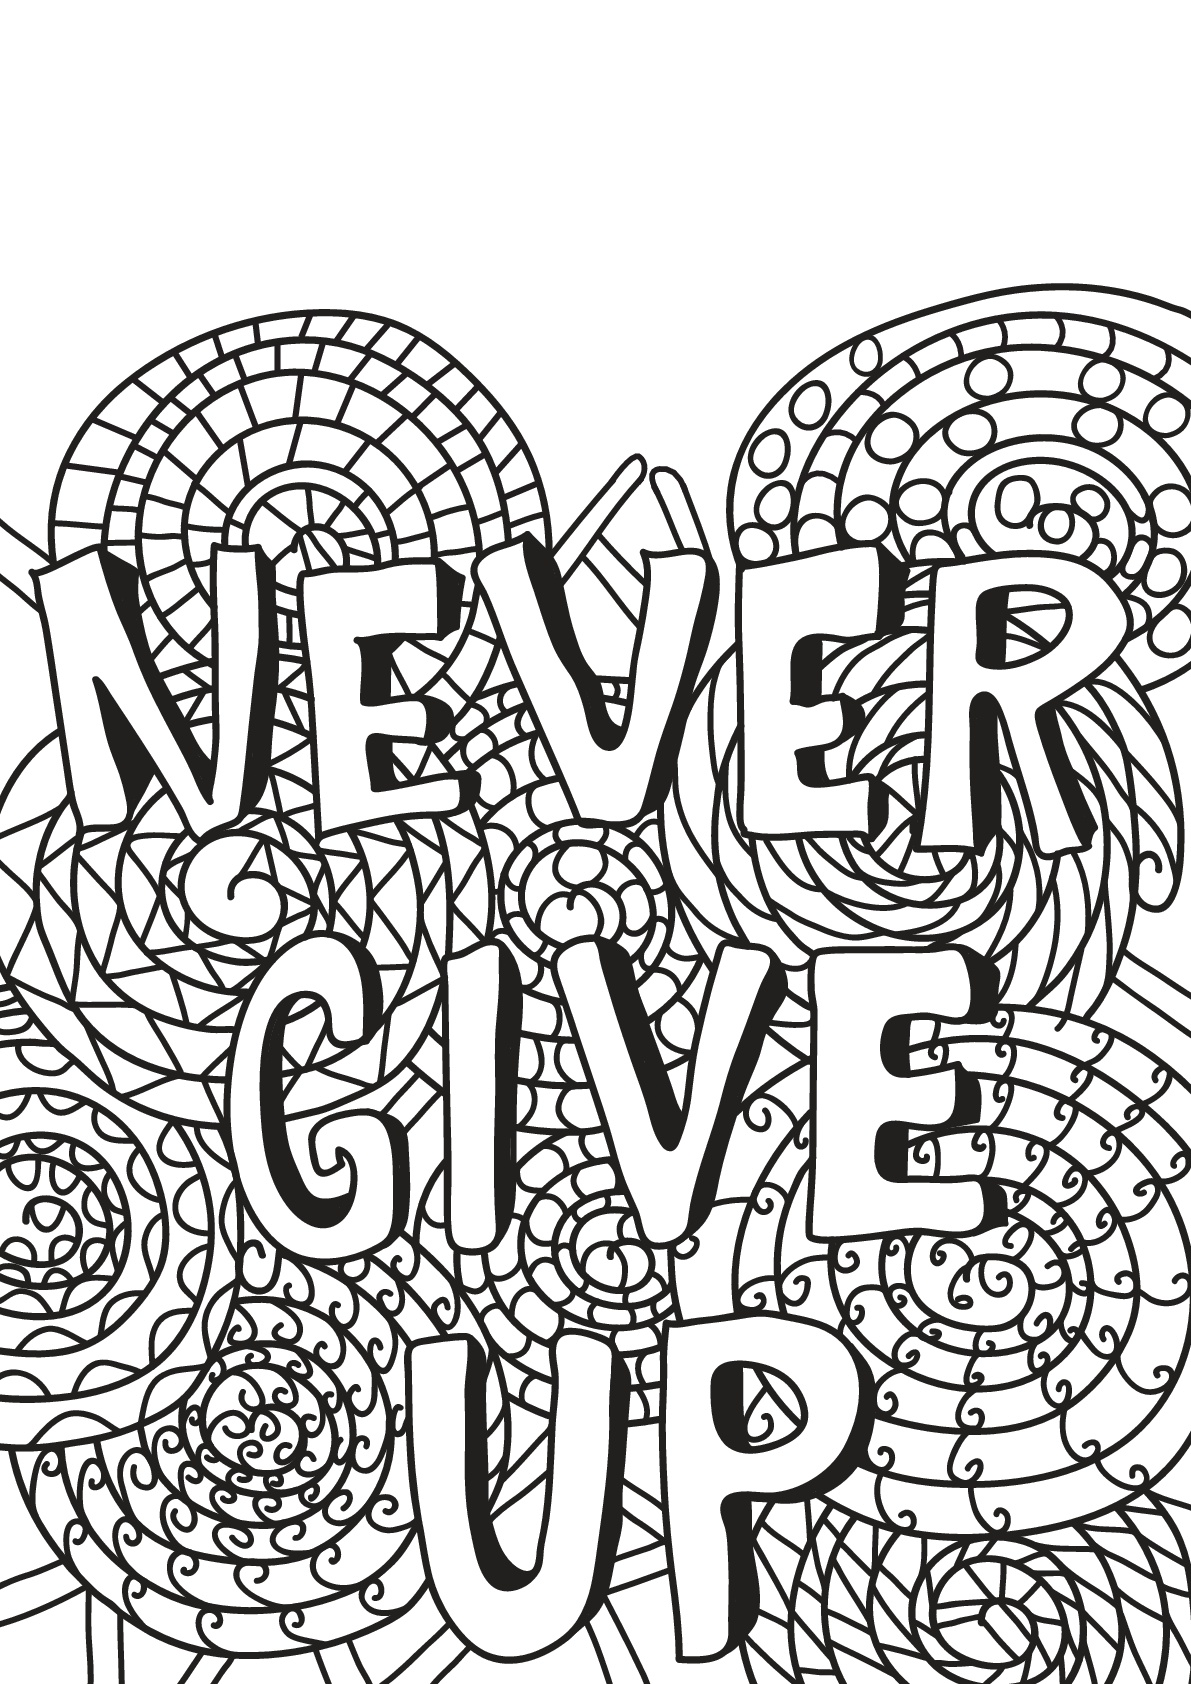 Never give up (Ne jamais abandonner)